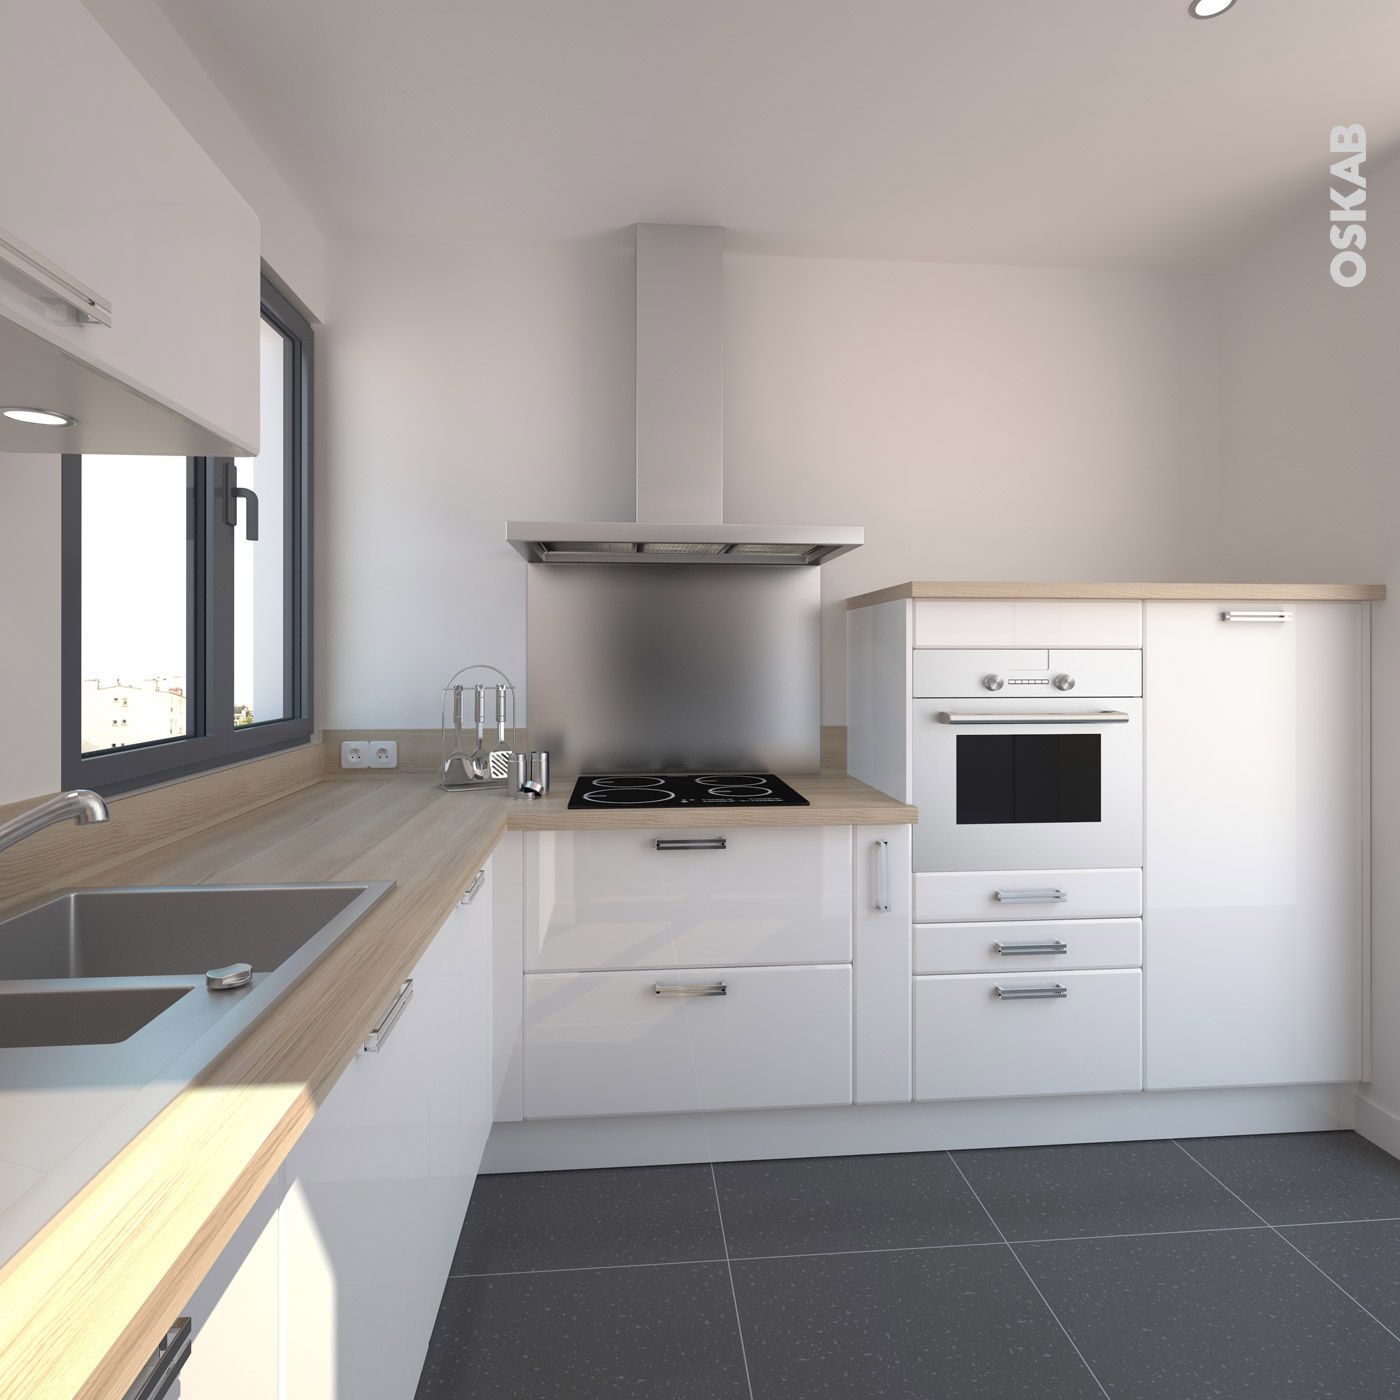 Prix Cuisine Ikea Sans Electromenager cuisine blanche design meuble iris blanc brillant | cuisines